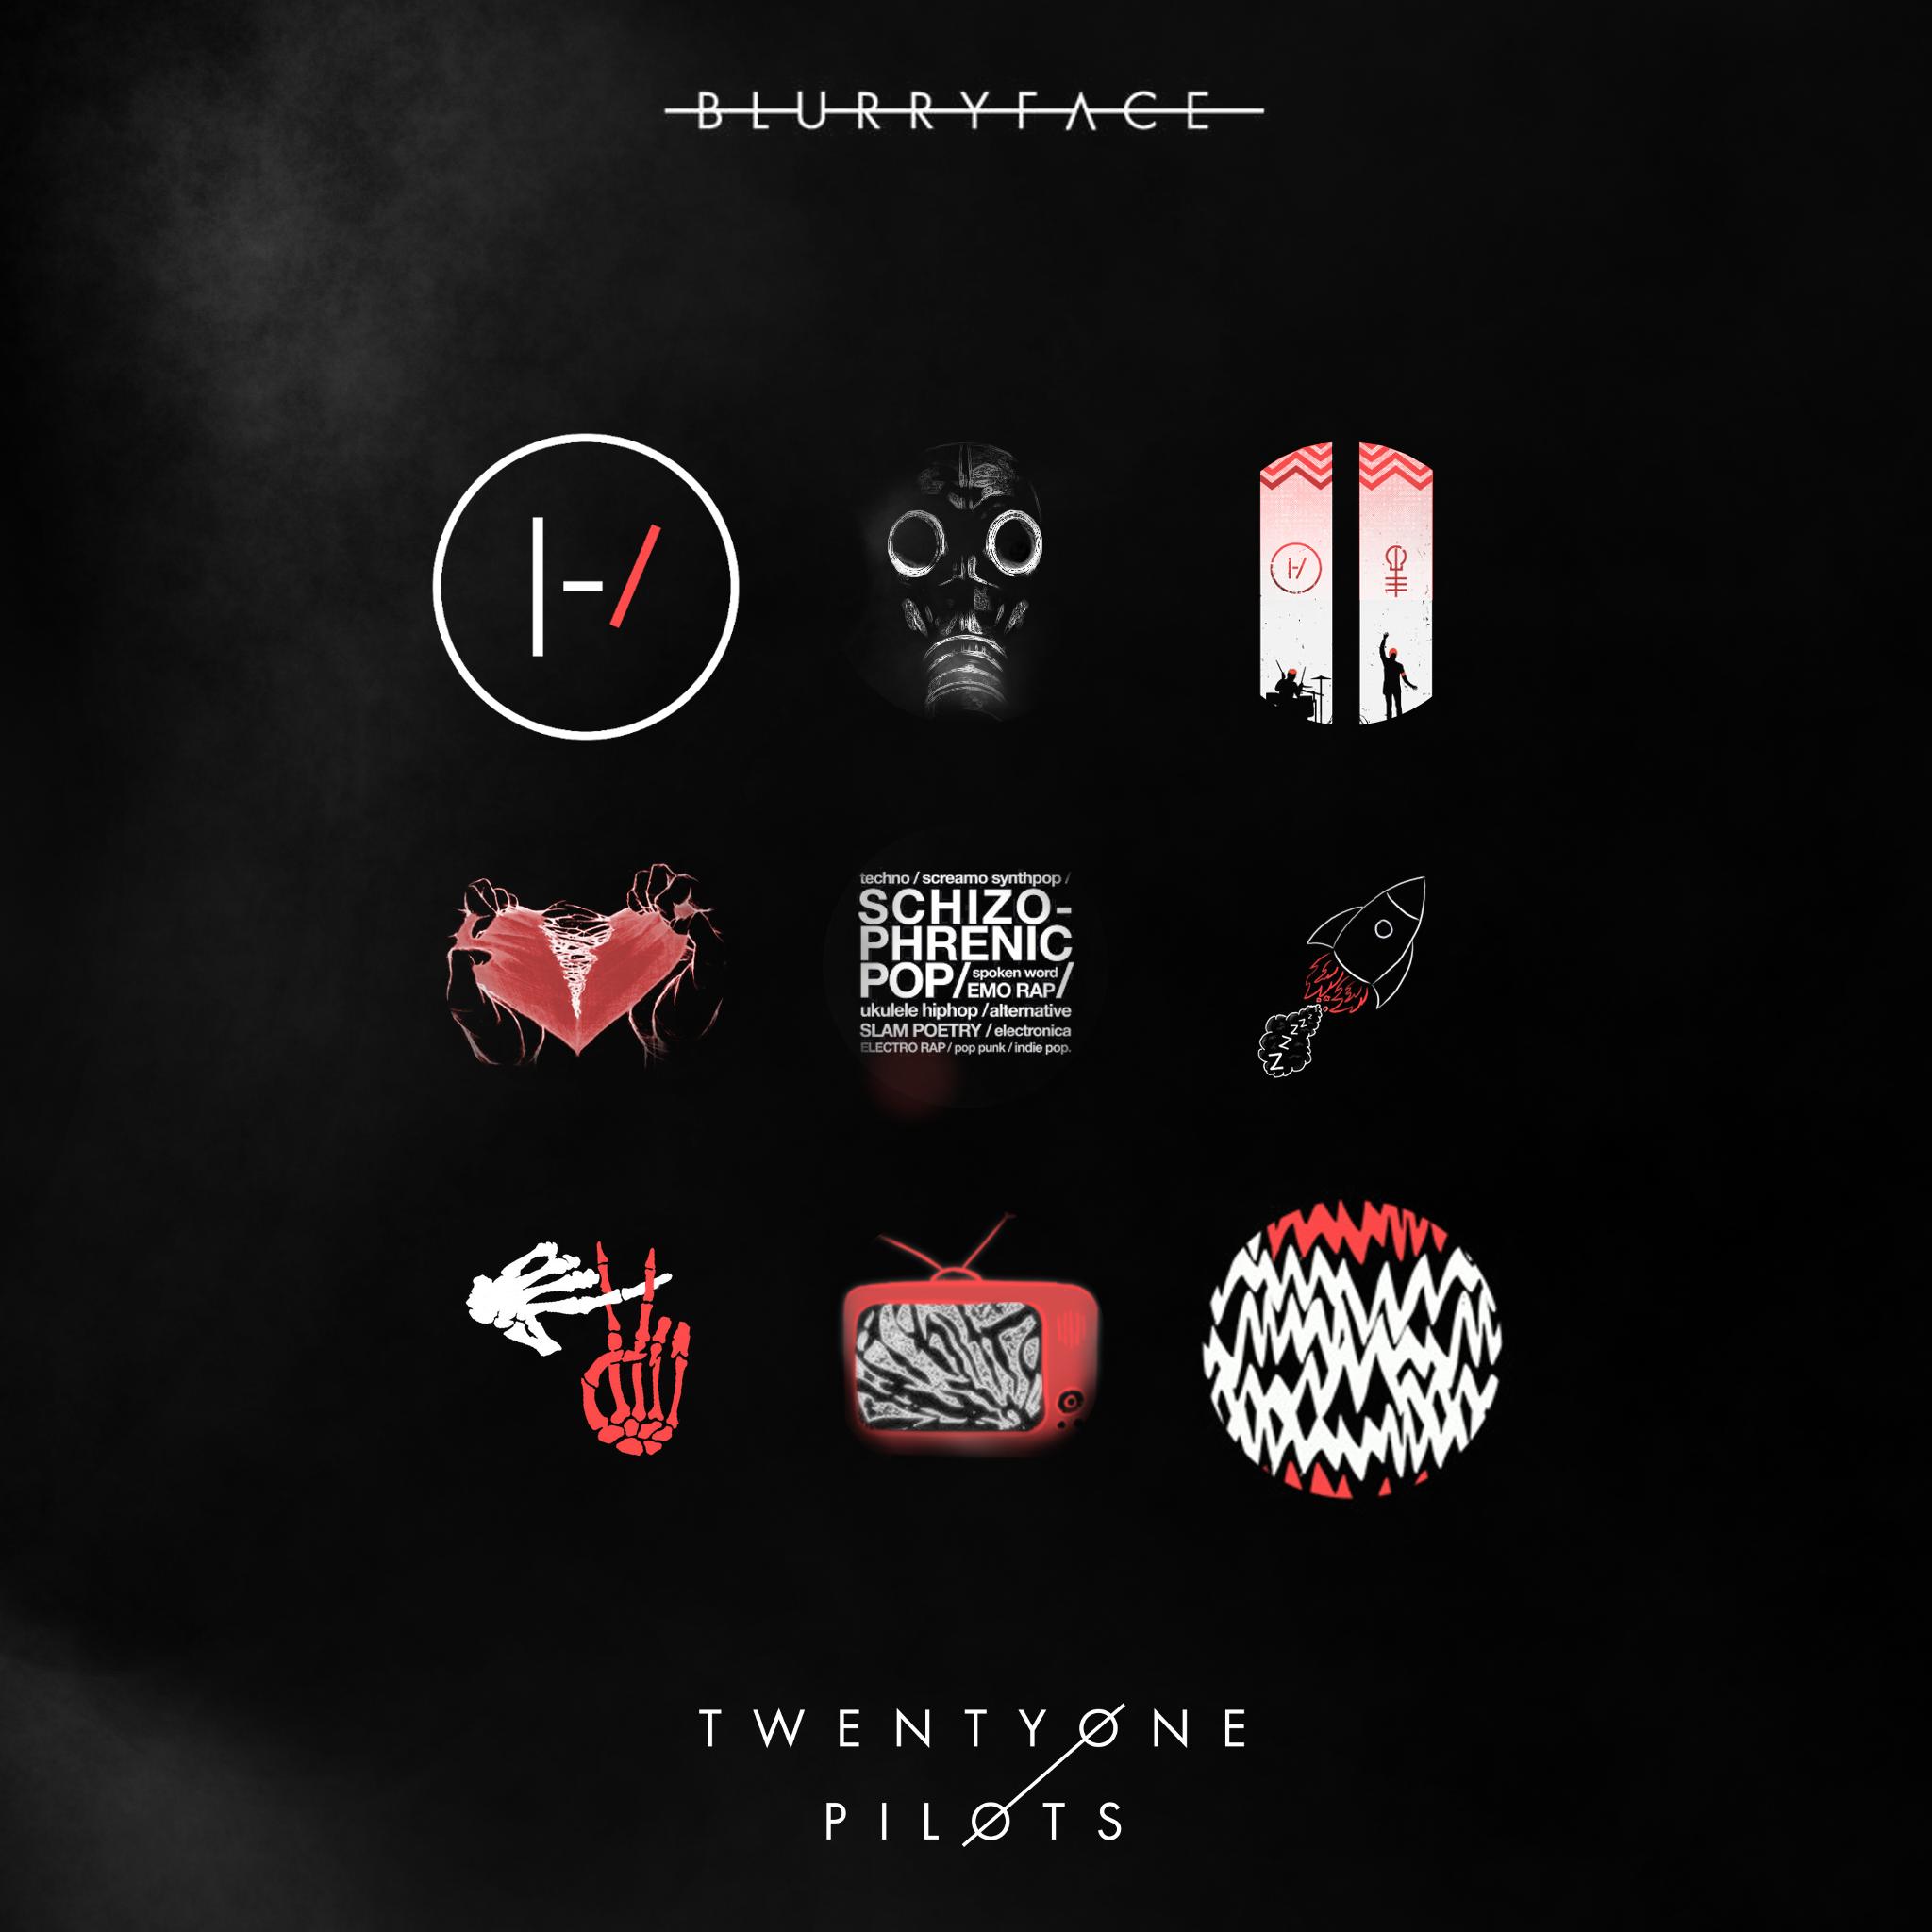 Twenty One Pilots Blurryface Art - HD Wallpaper